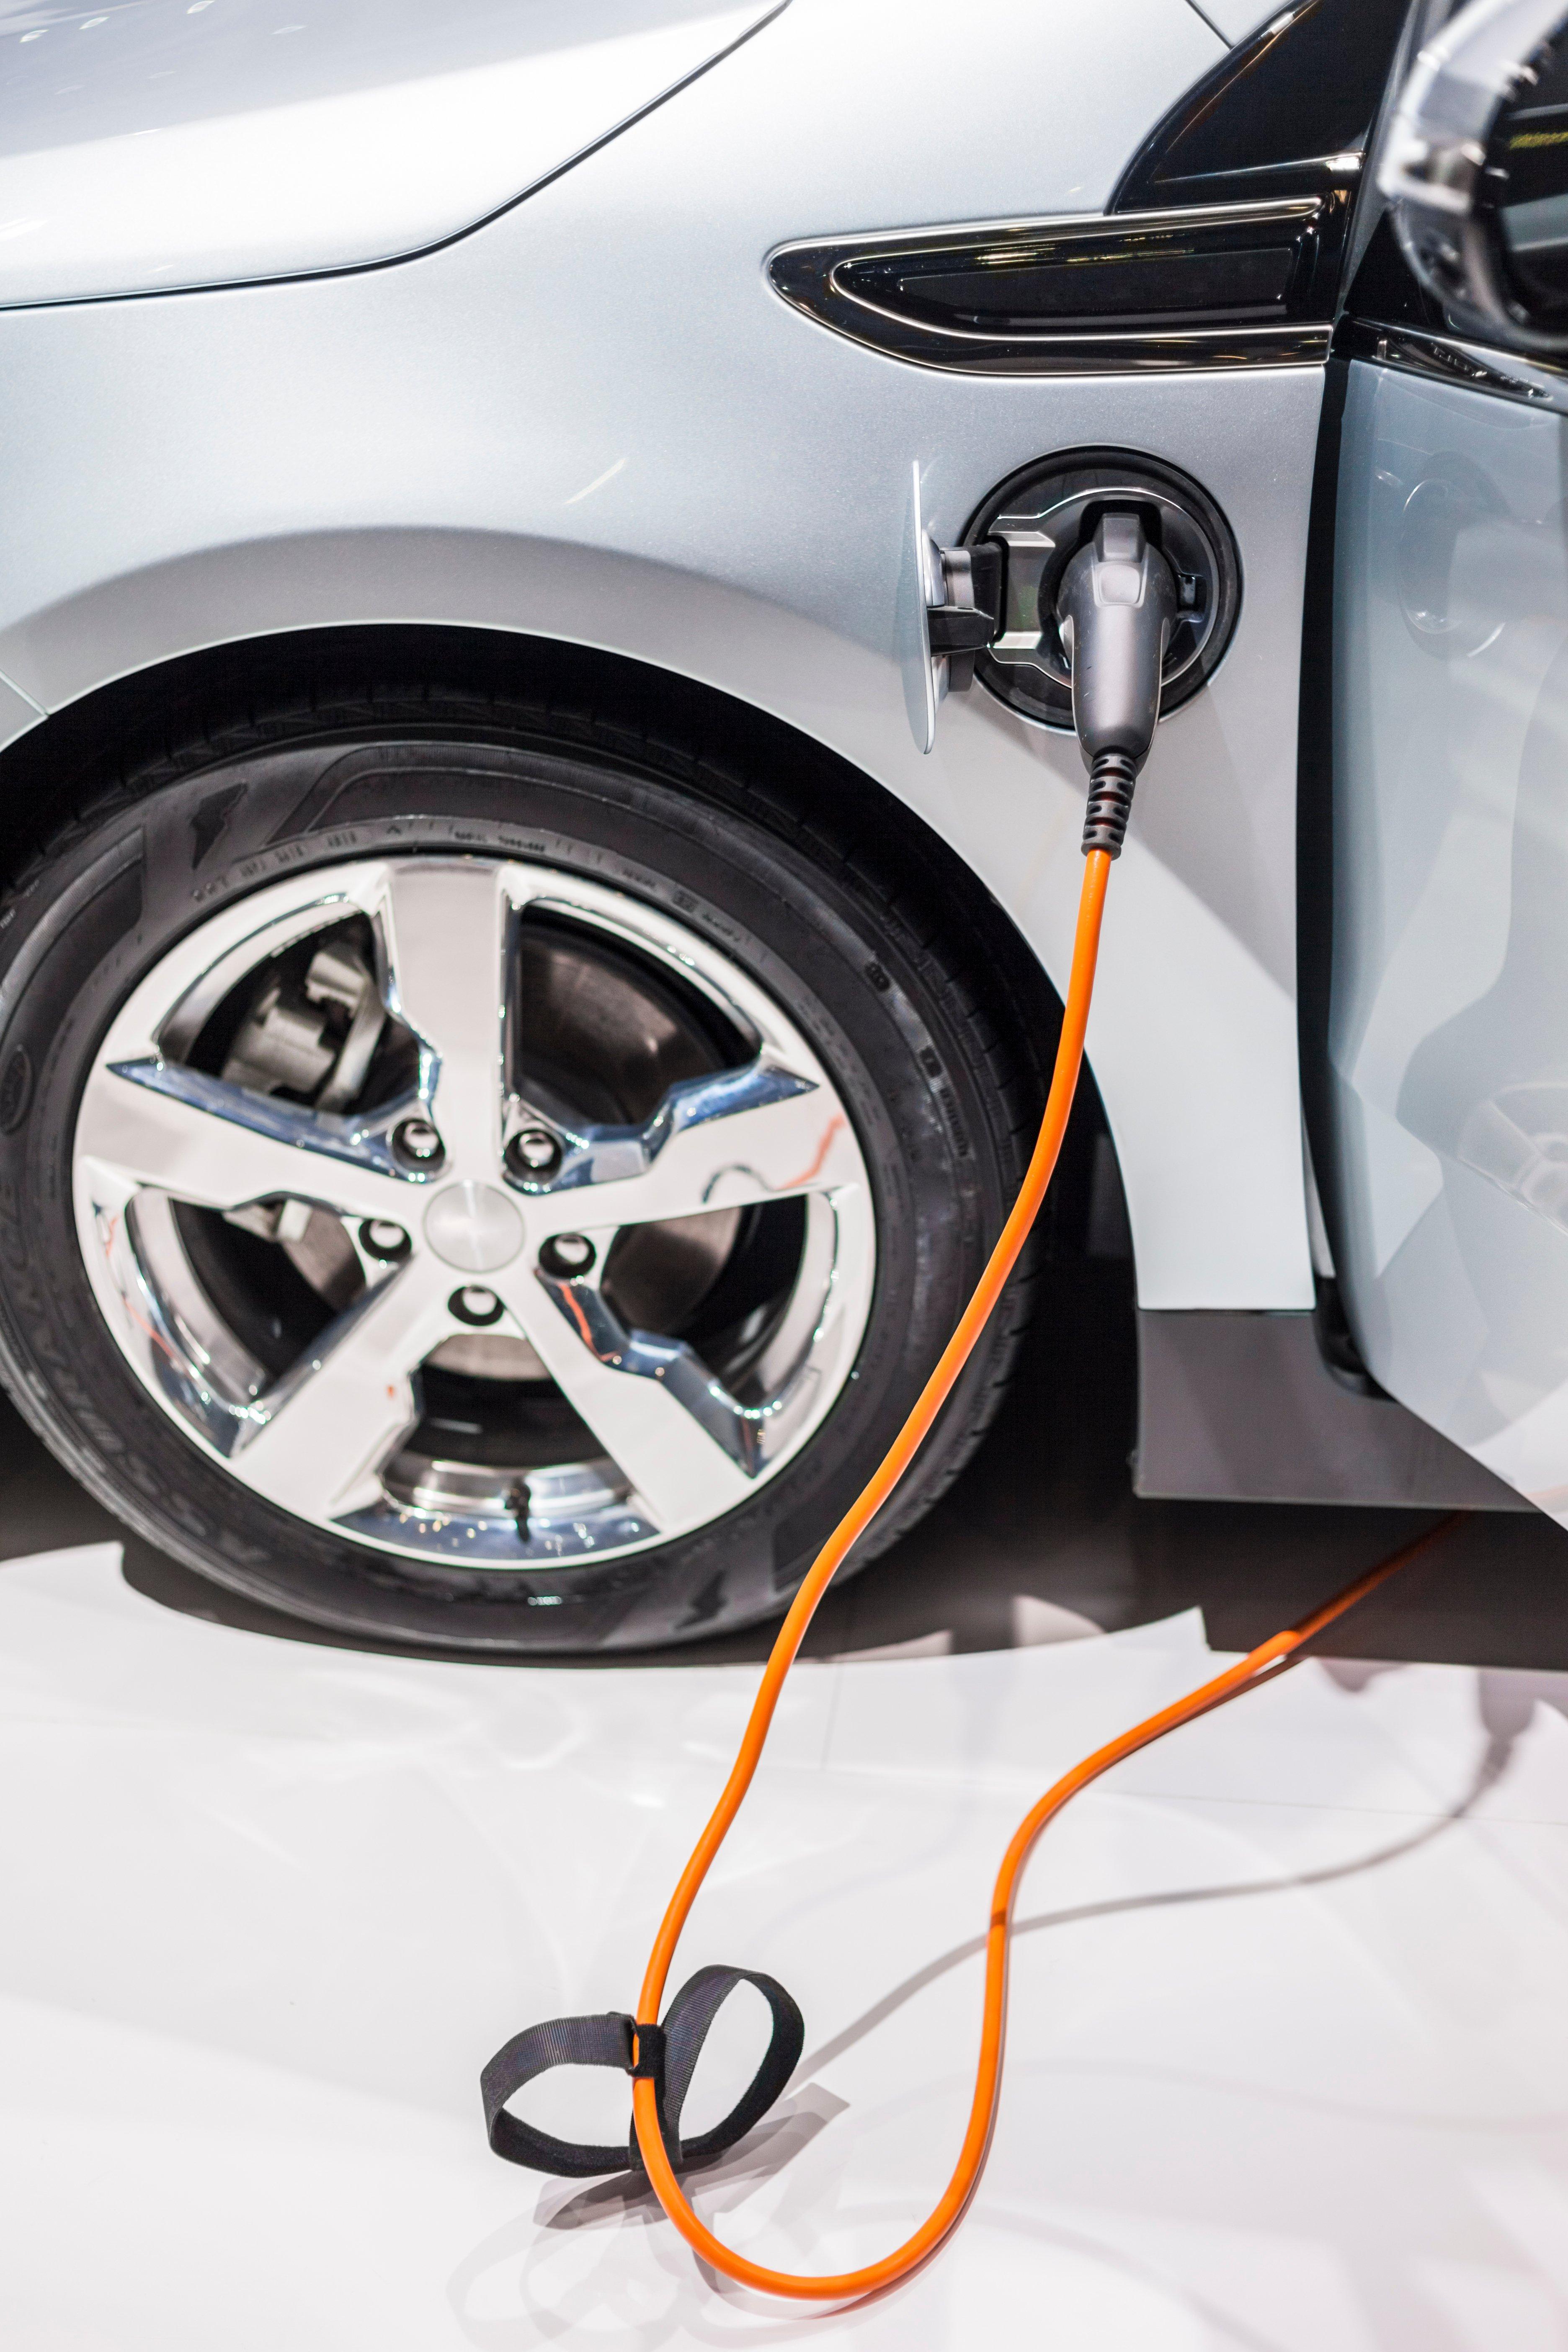 Electric vehicle market 2013